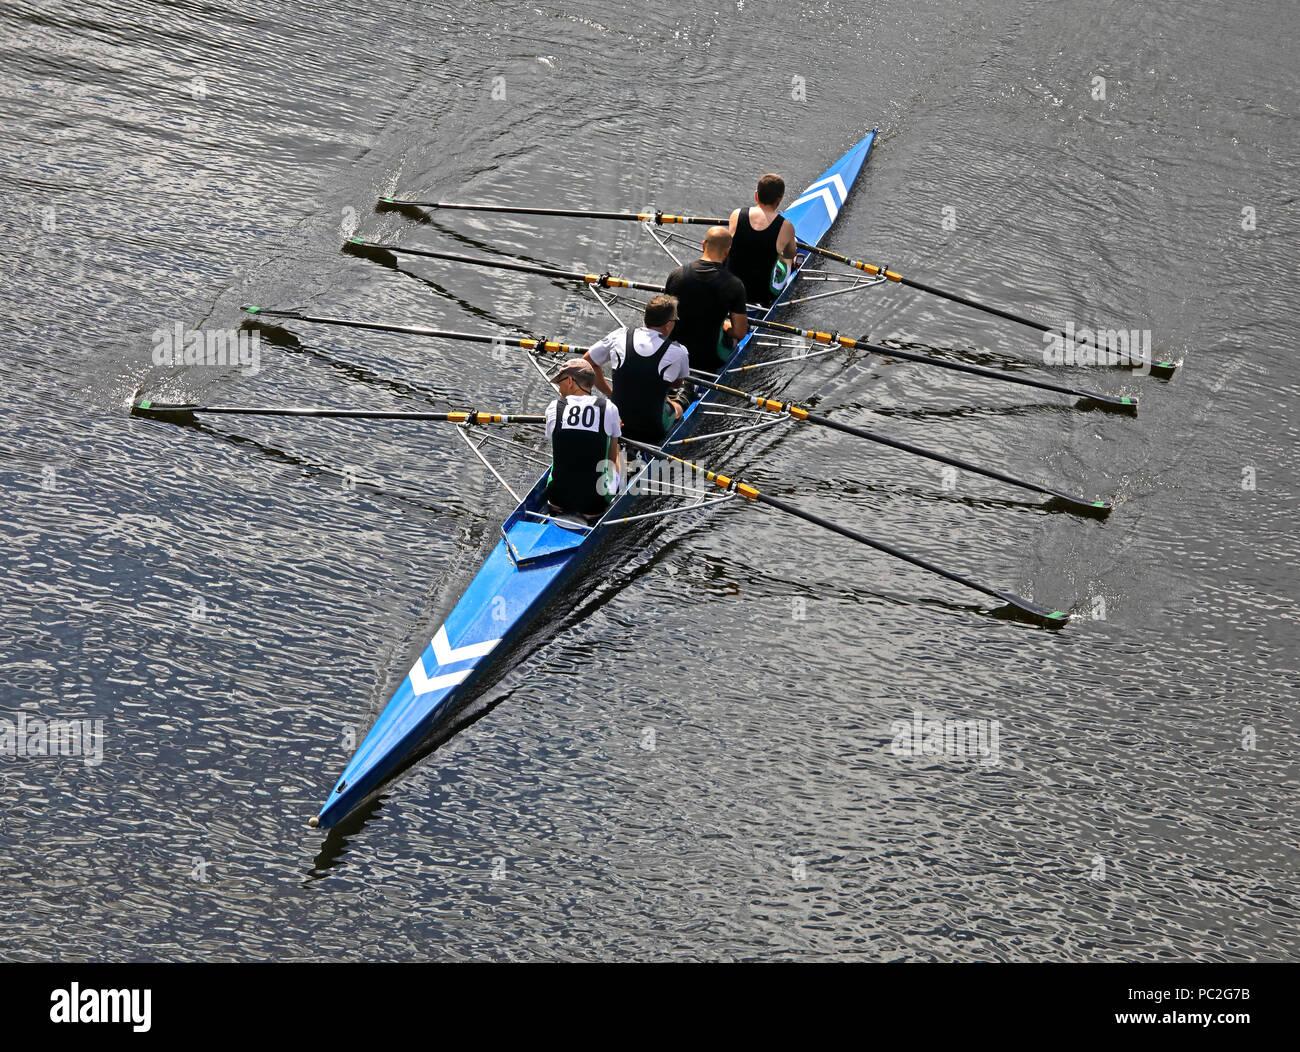 GoTonySmith,@HotpixUK,WRC,rowers,row,sport,youth,2018,Howley lane,Cheshire,North West England,UK,river Mersey,Mersey,teamwork,teams,Warrington Rowing,rowing course,learn to row,Warrington learn to row,junior,seniors,boat,skull,skulling,boats,sail,sailing,sailing on the river,men